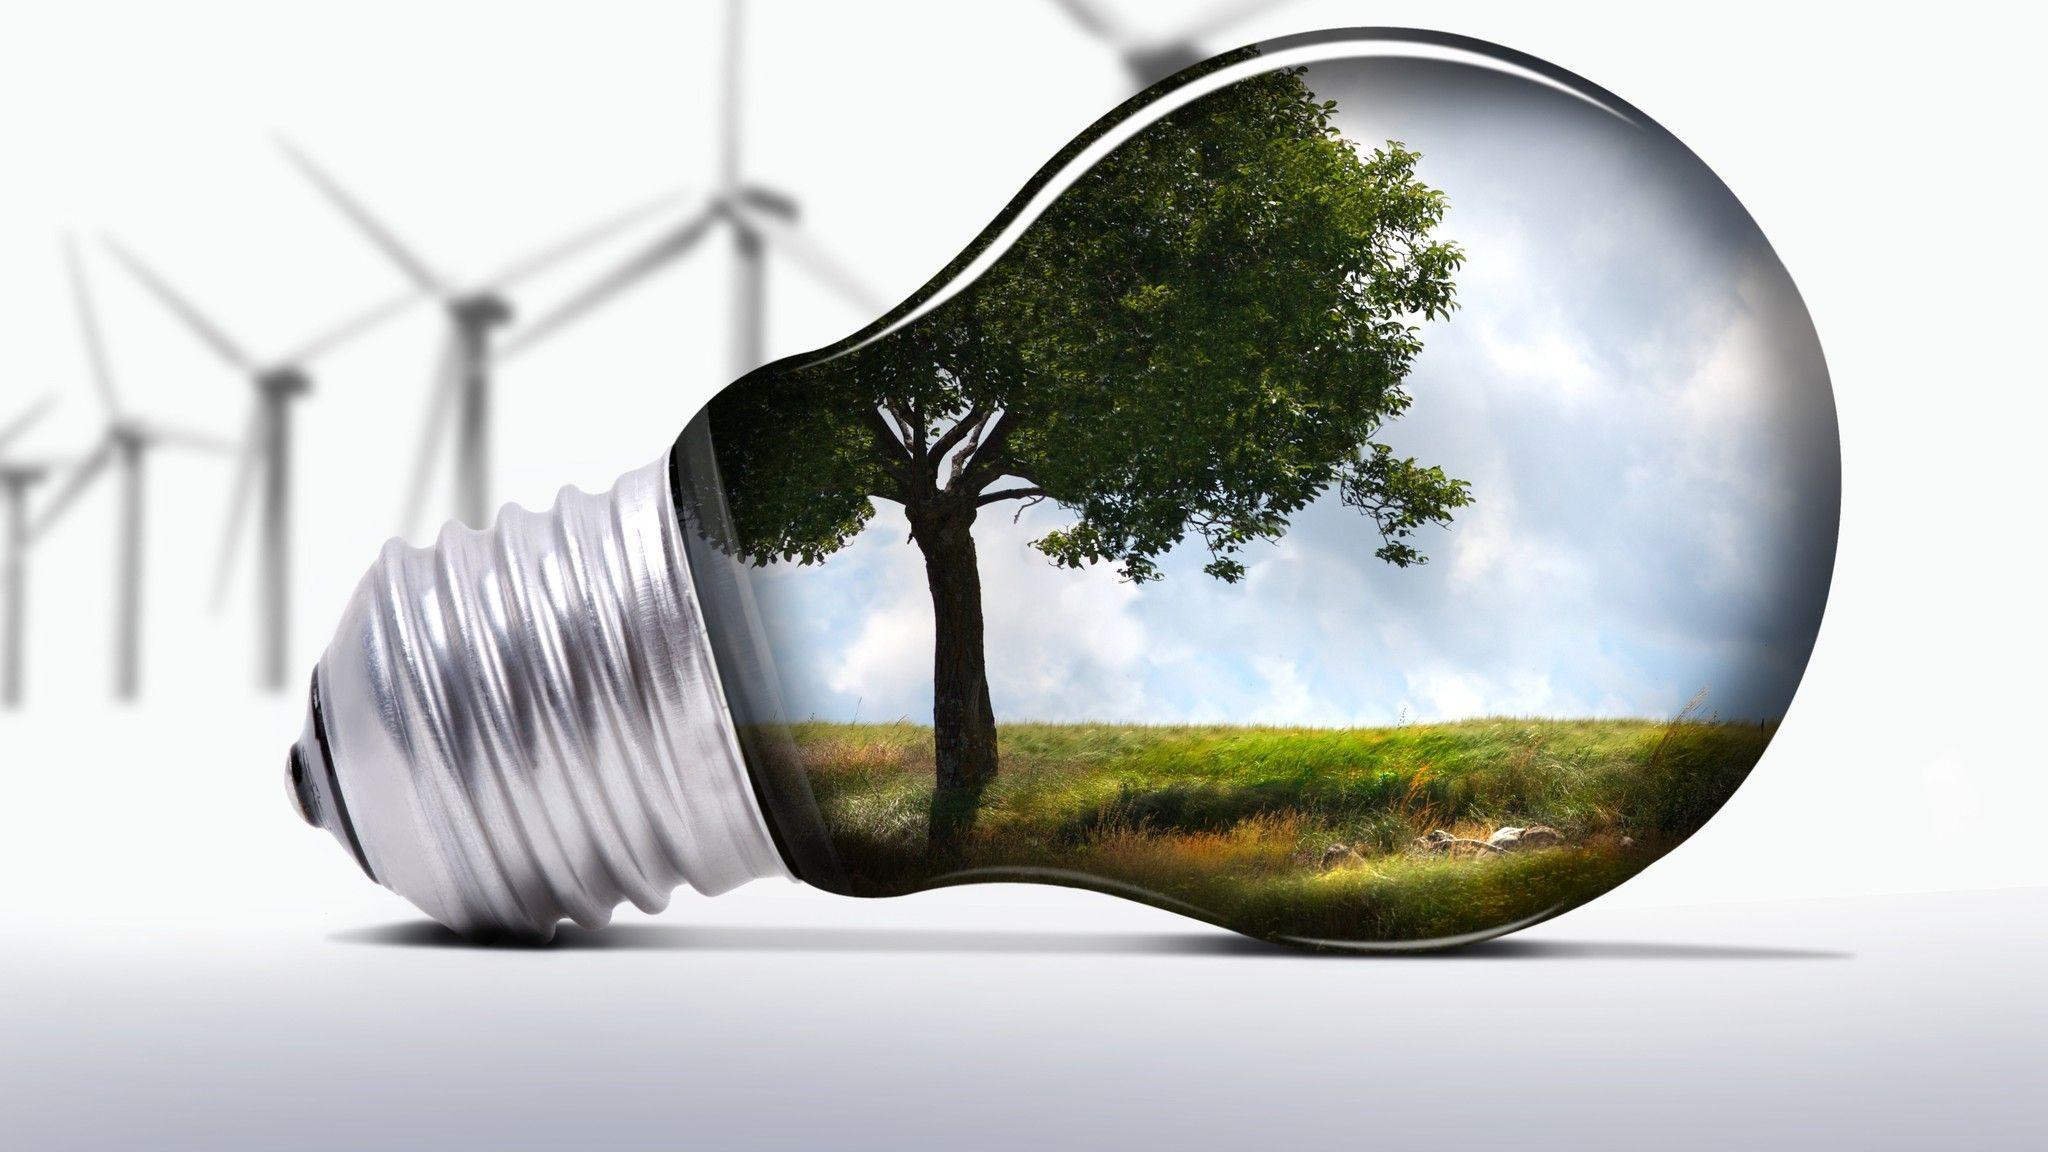 energosberezhenie-i-energoeffektivnost